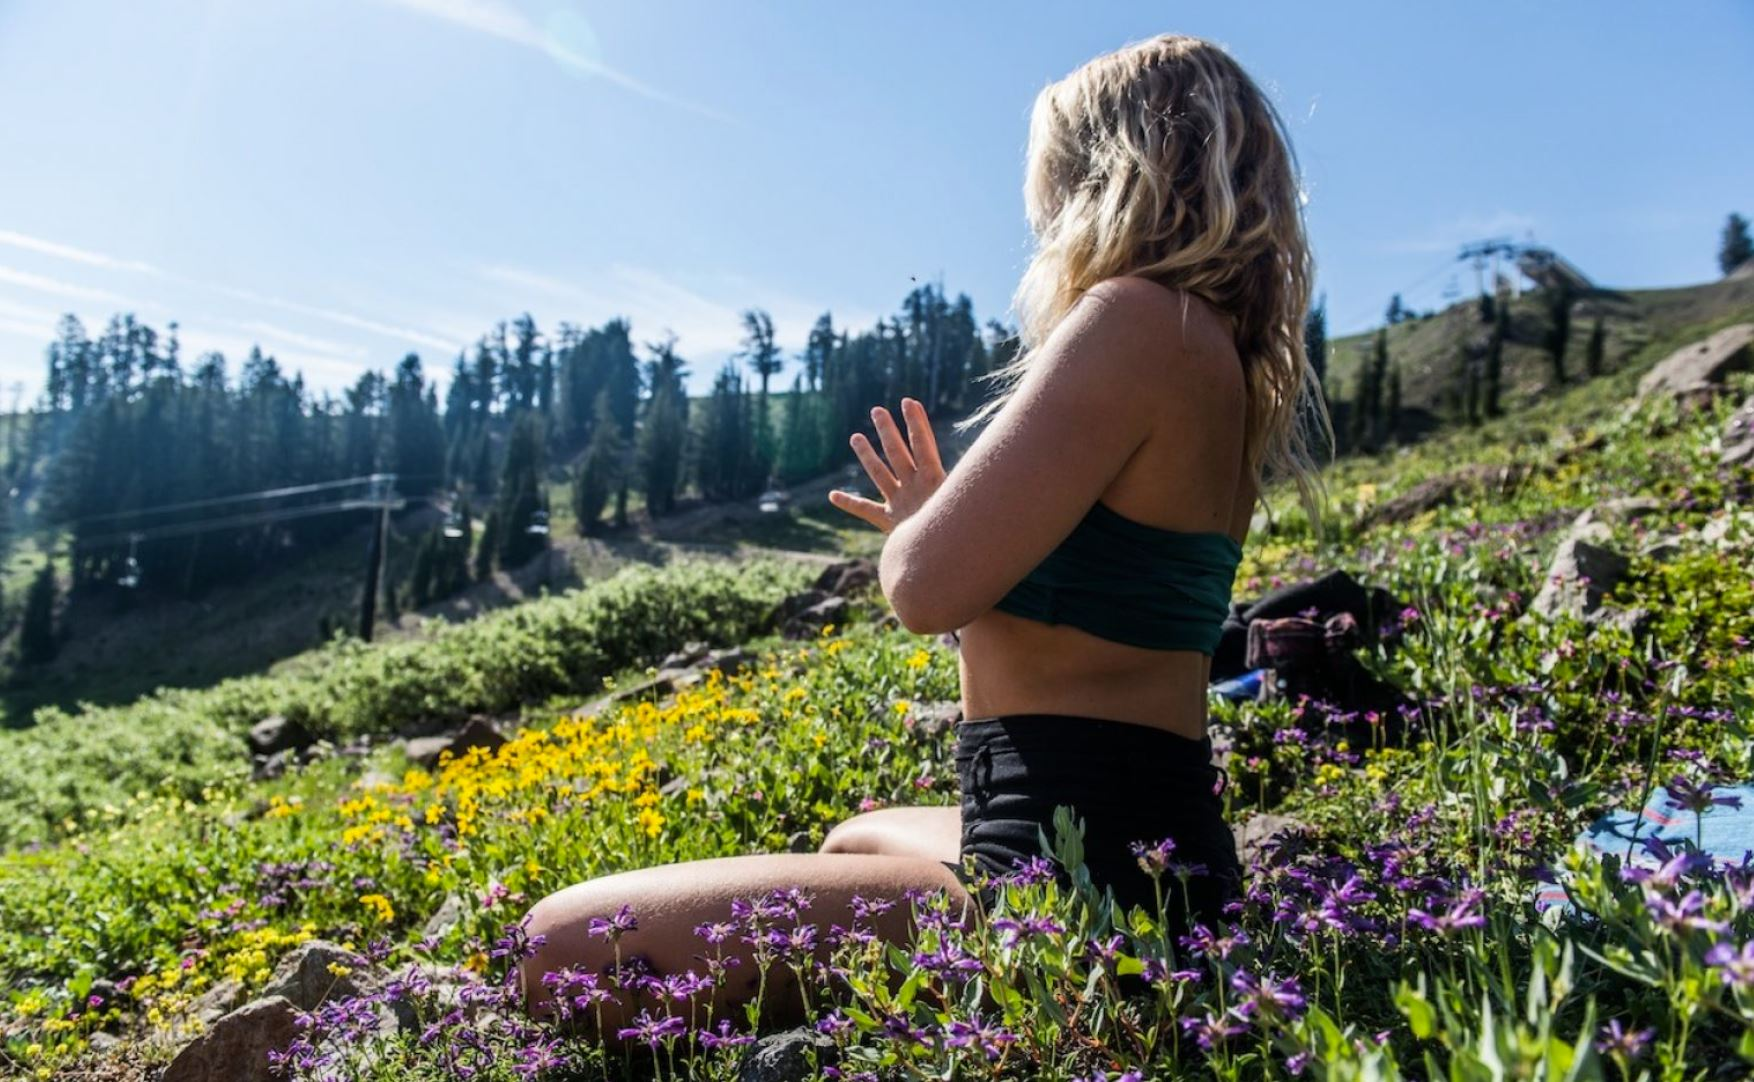 Steps to Manifesting Love